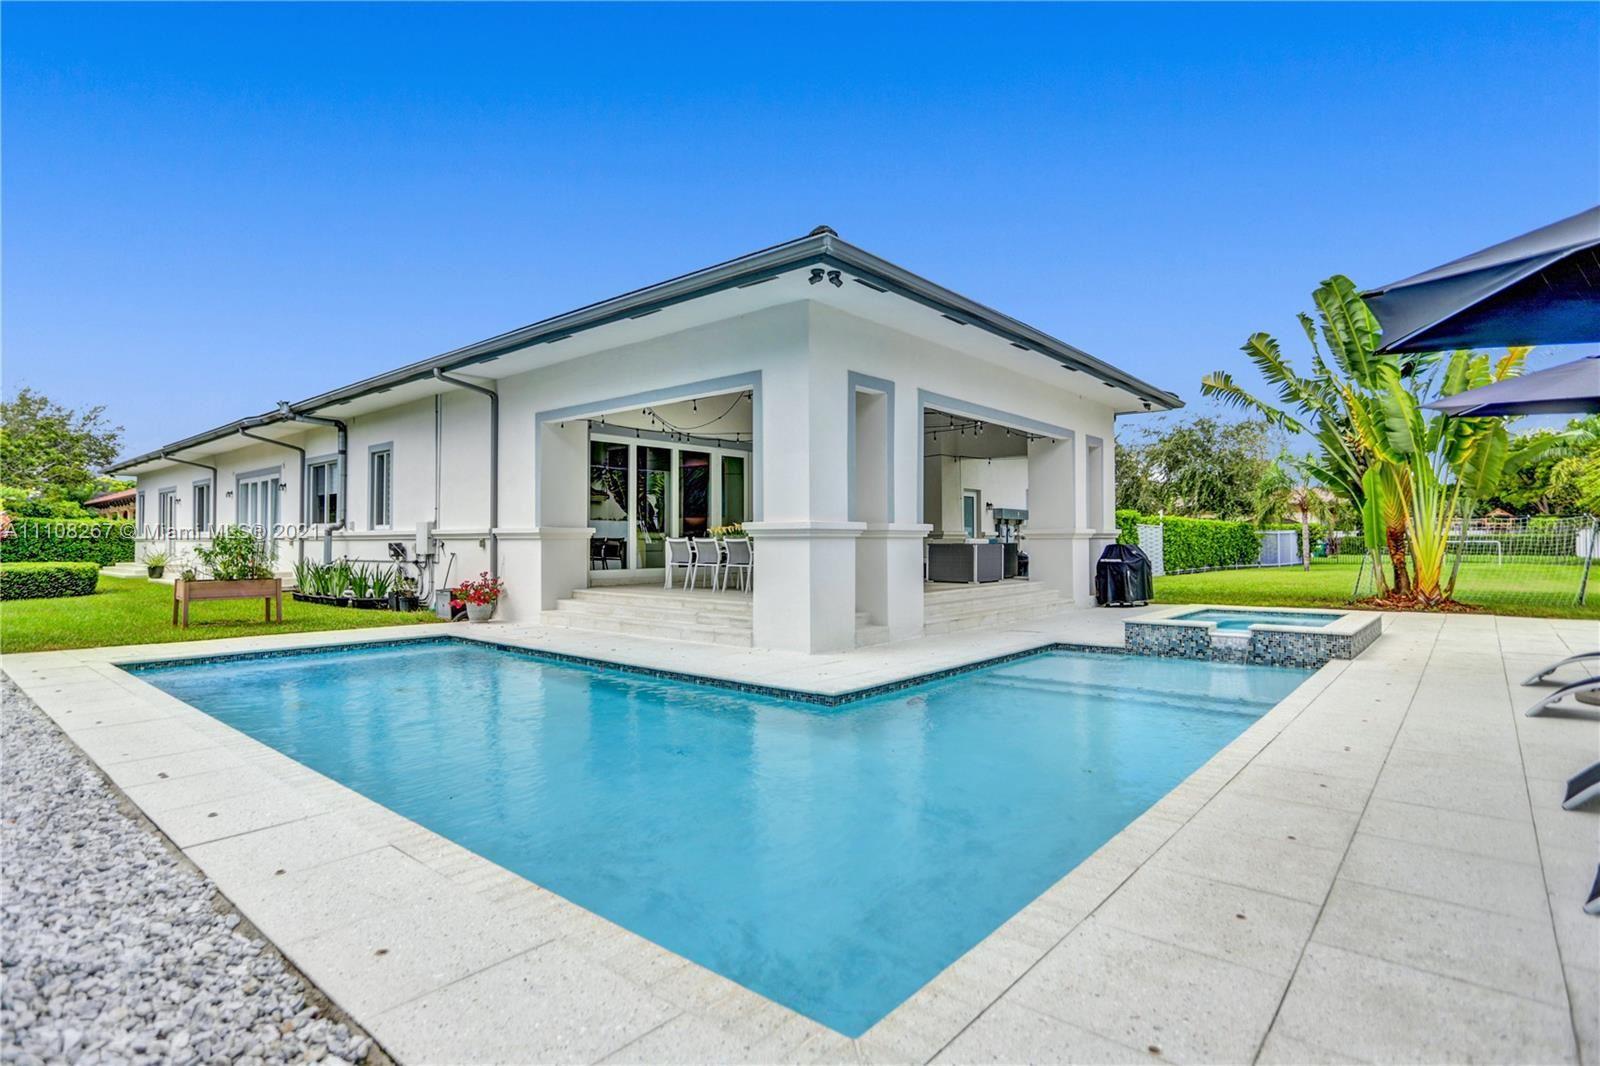 Photo of 9580 SW 101st Ter, Miami, FL 33176 (MLS # A11108267)